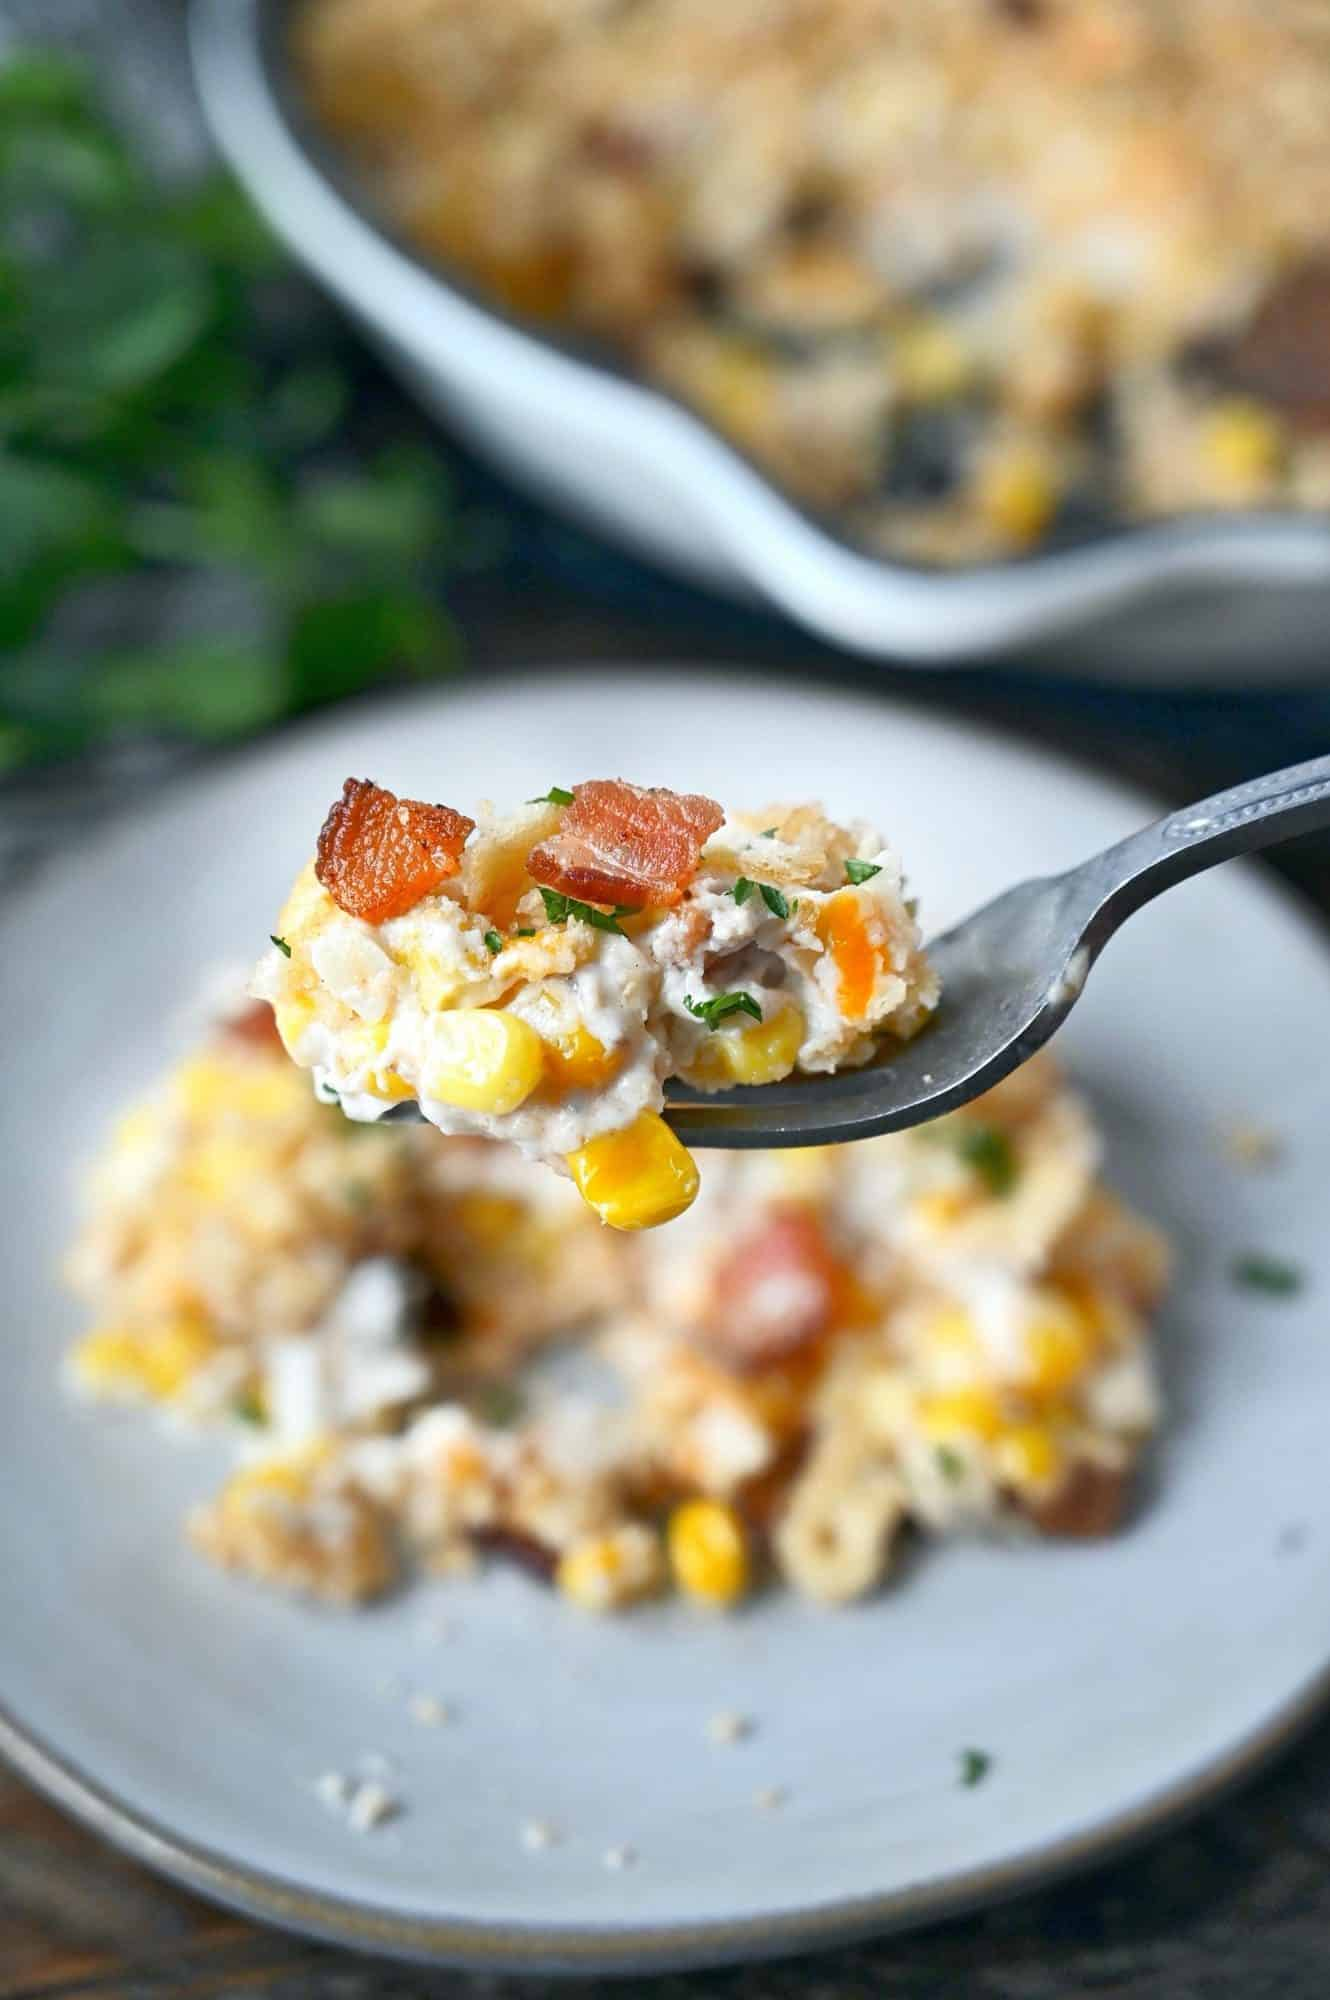 Cheesy creamed corn bite on a fork.